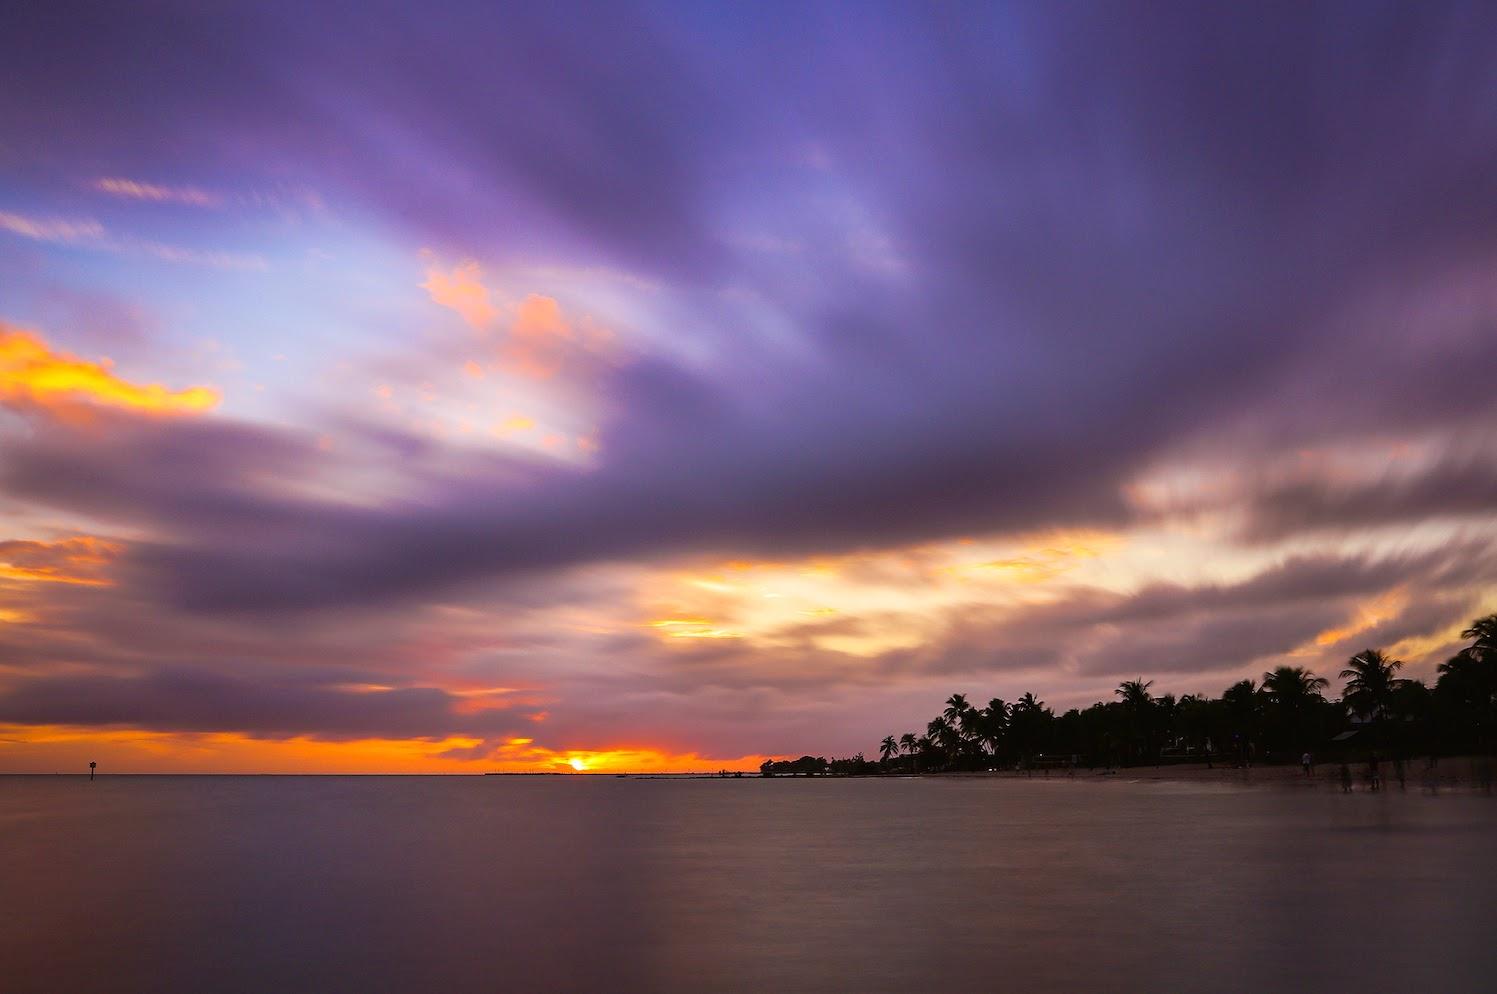 Il tramonto a Key West, by Joe Parks